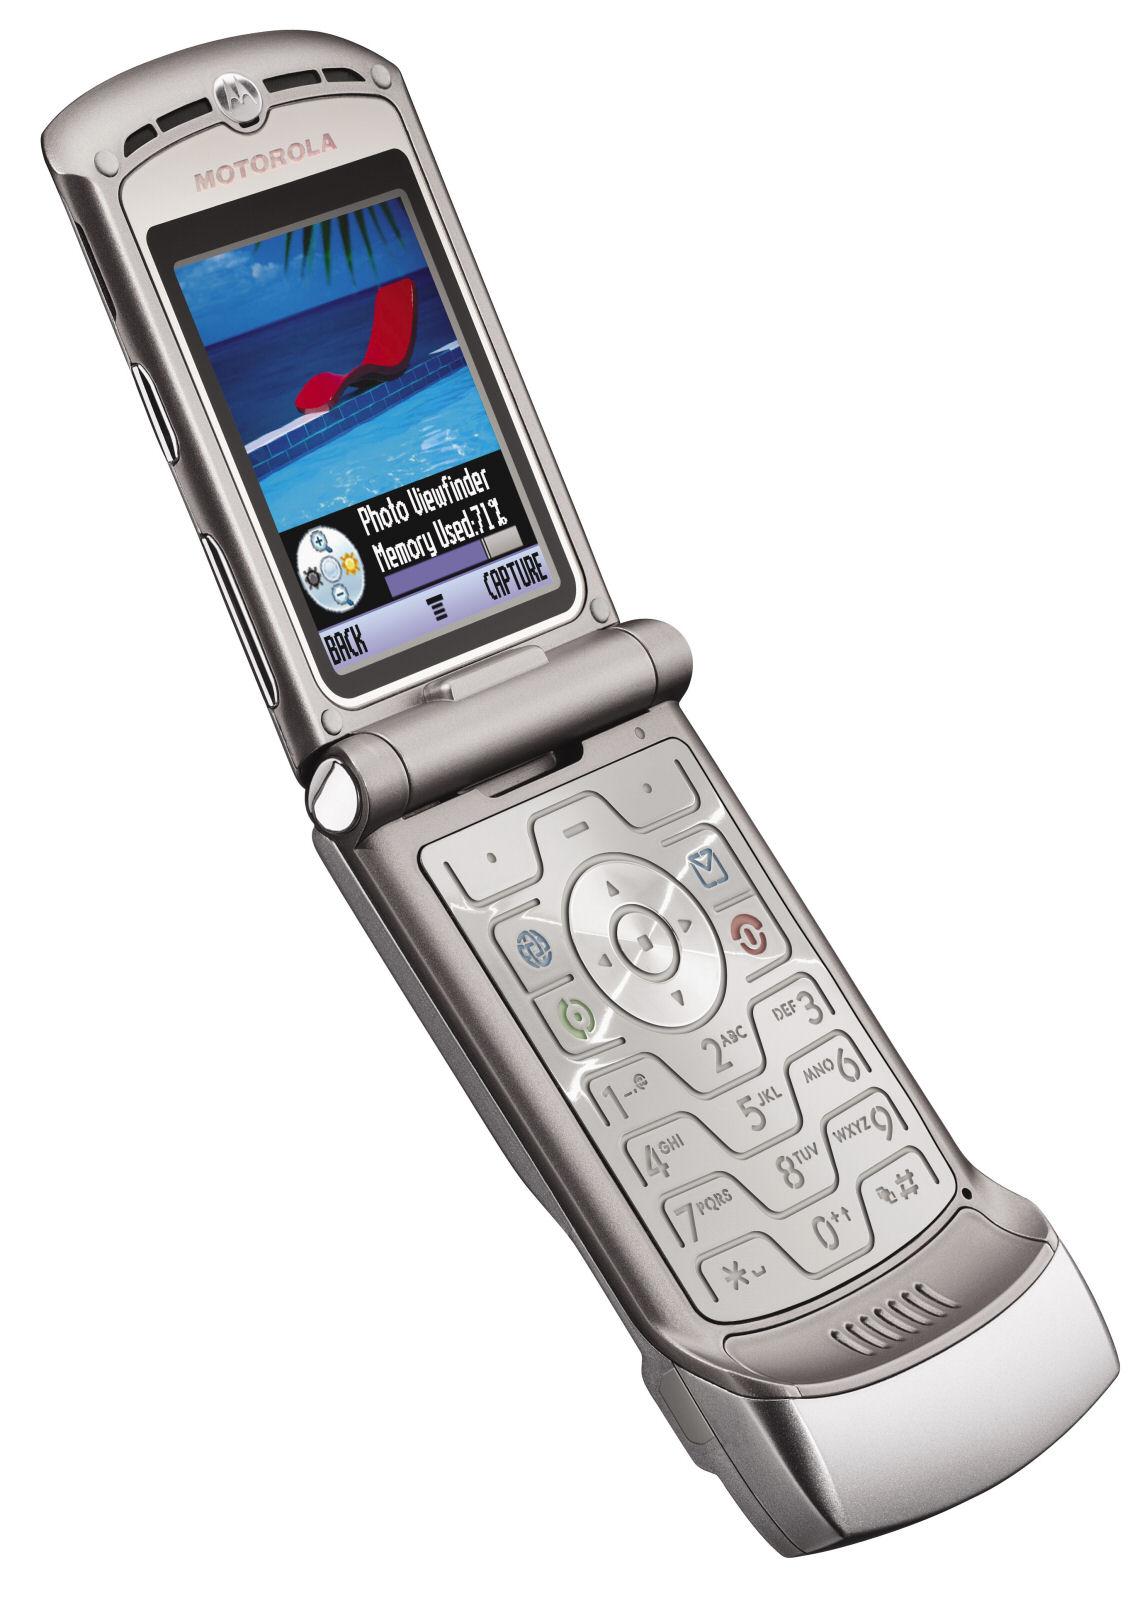 ProductWiki  Motorola RAZR V3   Cell Phones